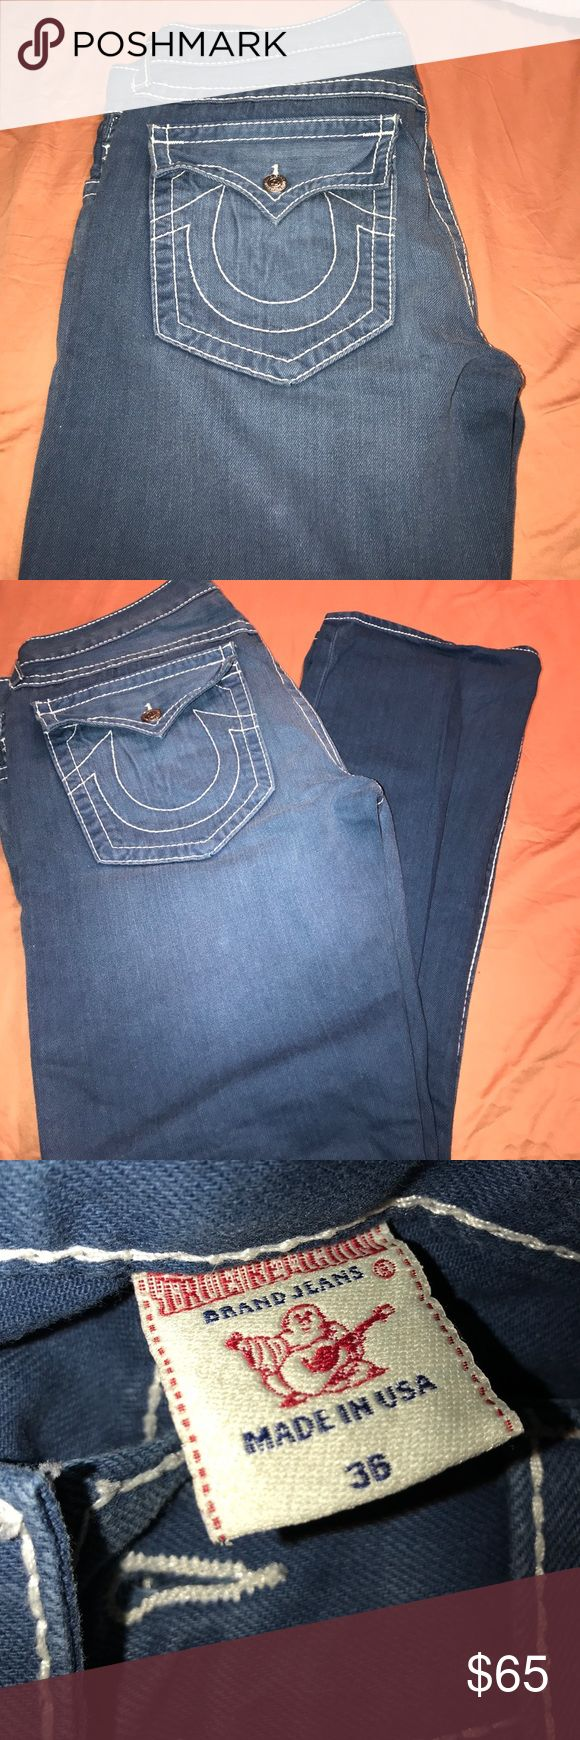 Great Condition True Religion Men Jeans True Religion Men Jeans Straight Fit Great Condition waist 35 length 32 True Religion Jeans Straight